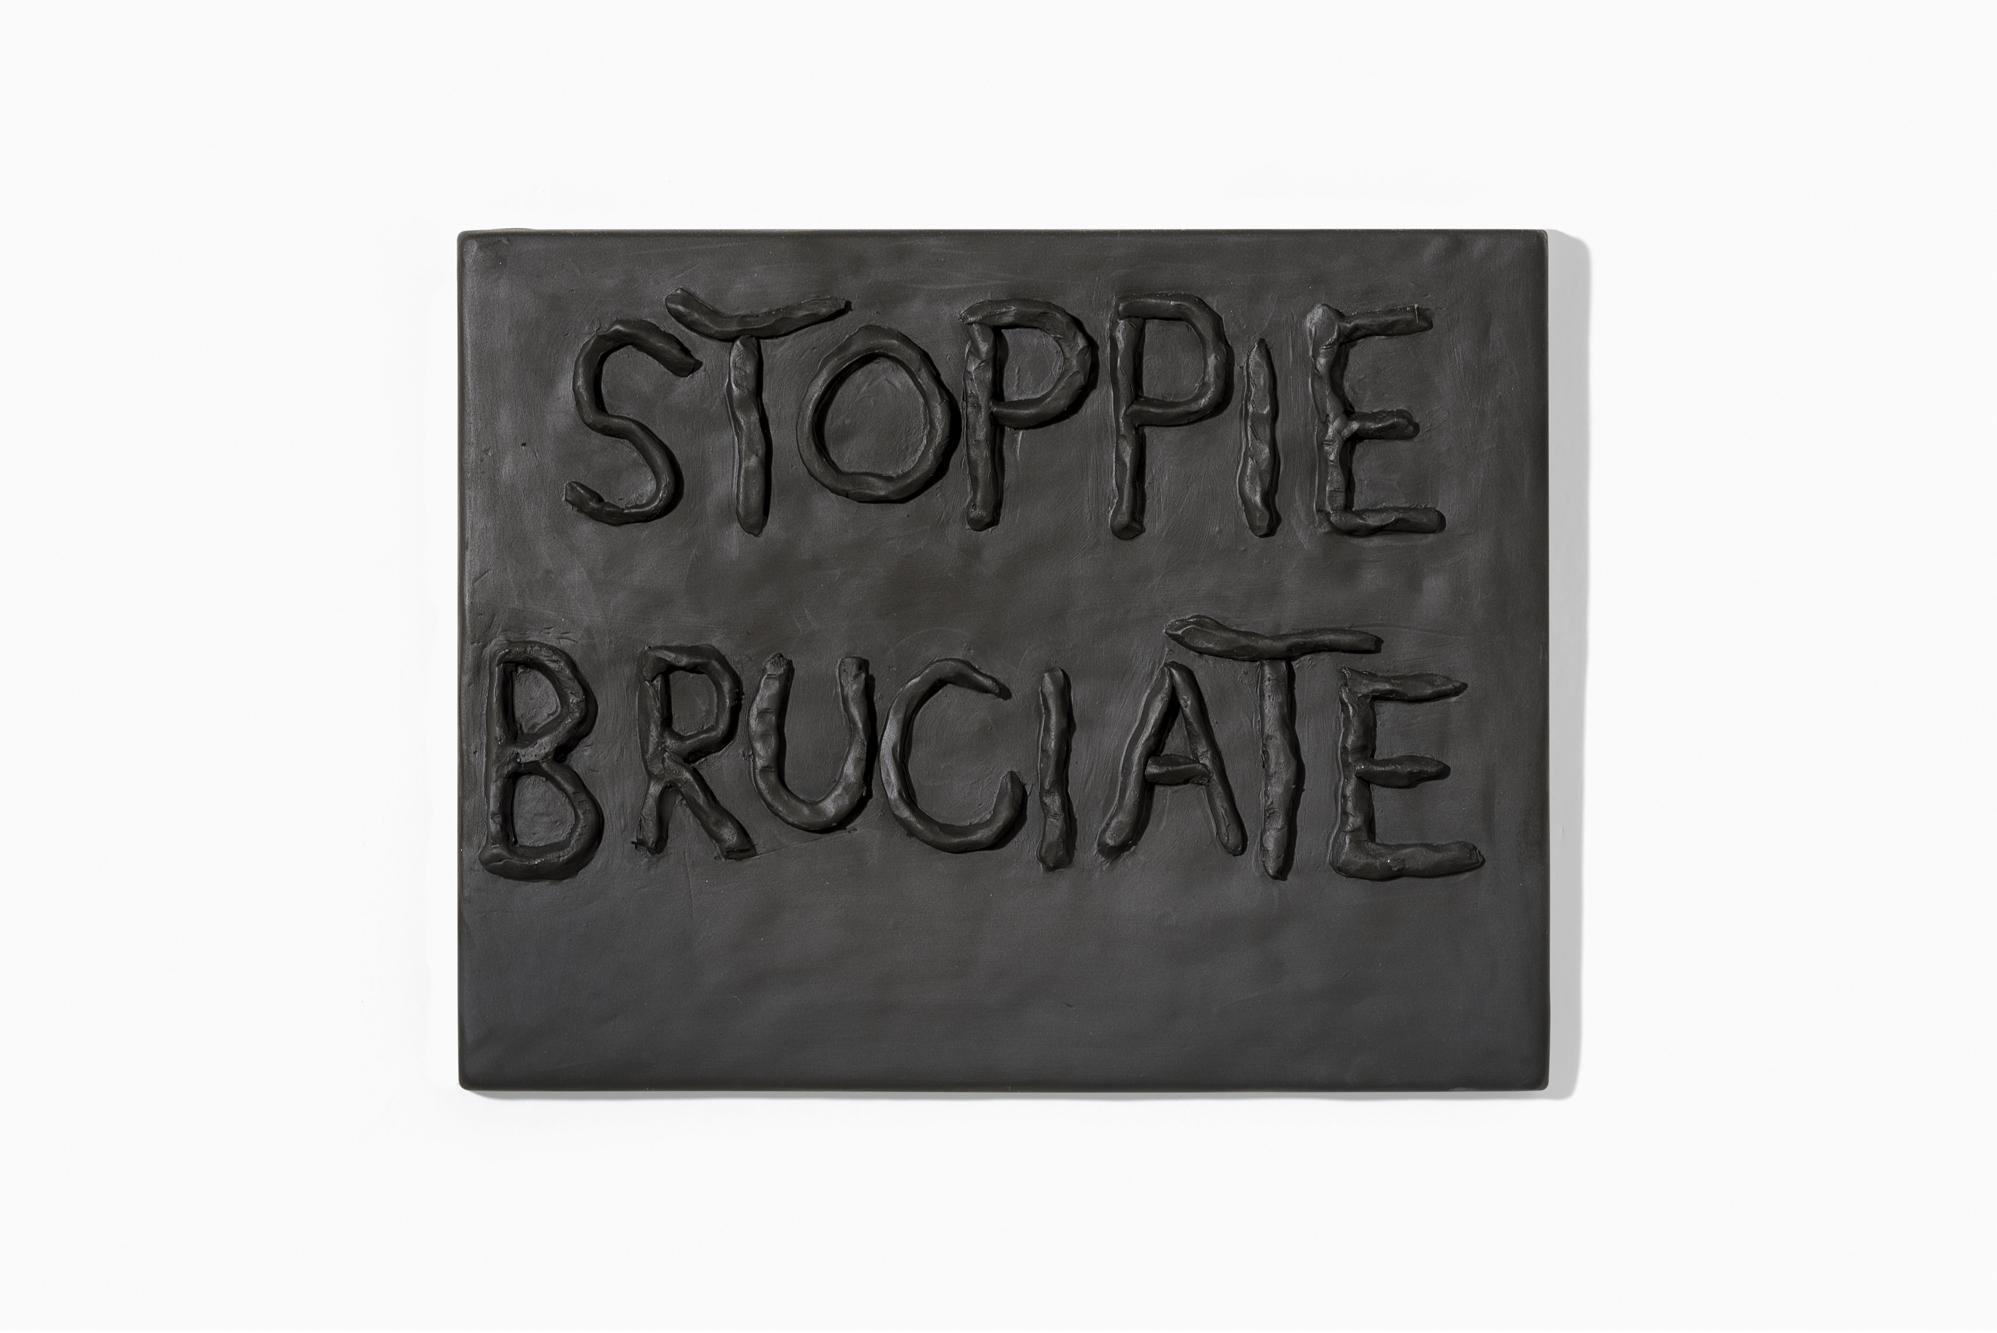 """Stoppie bruciate"" 2018, terracotta, 43 x 33 cm"